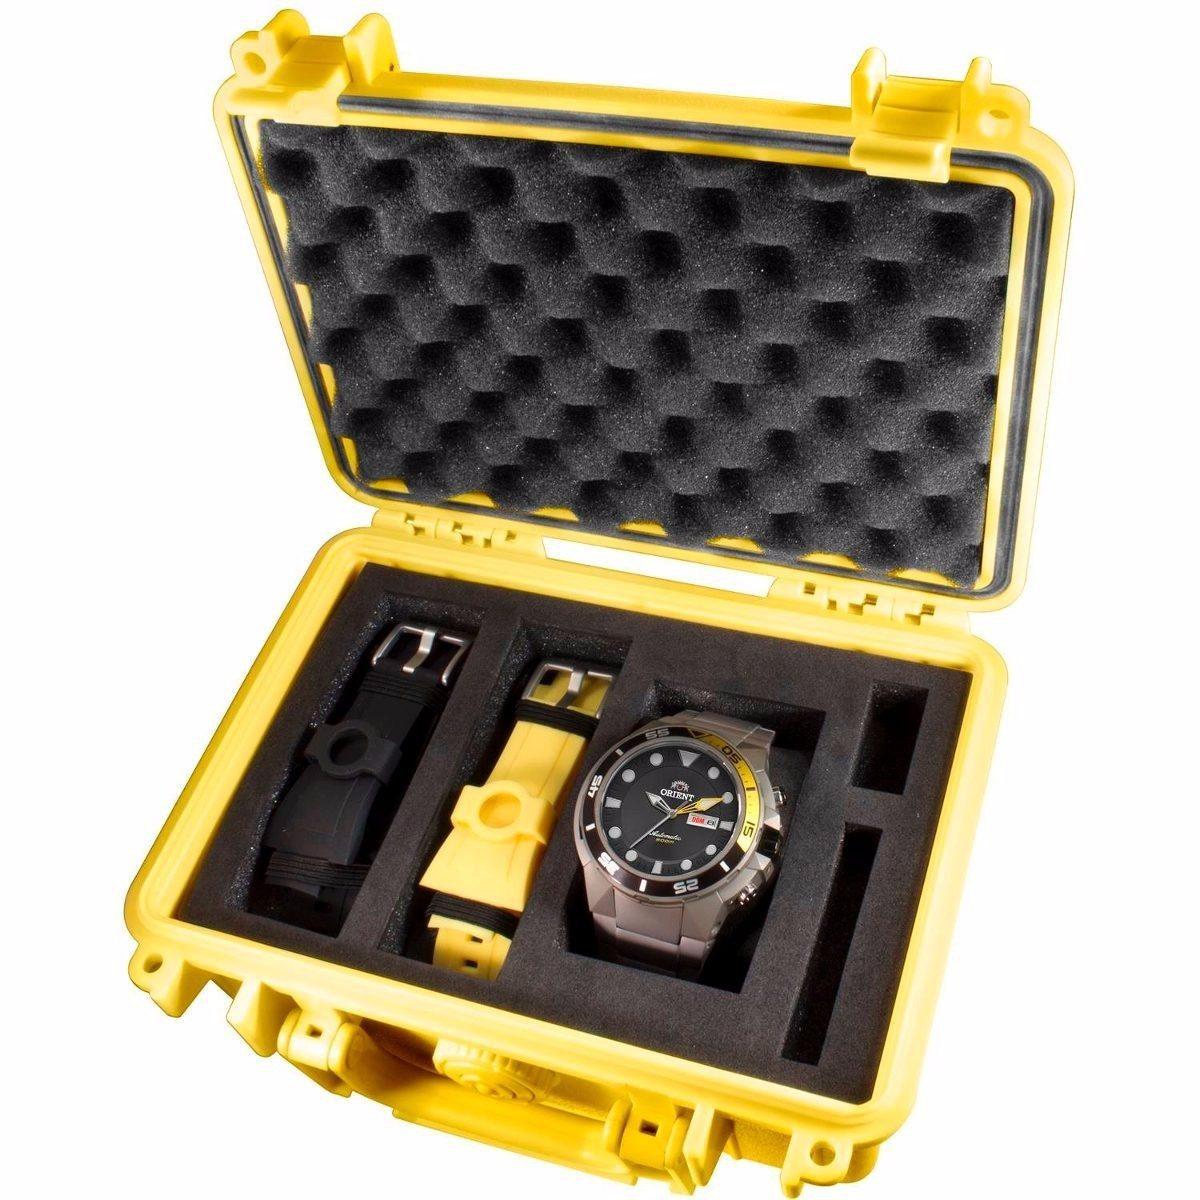 8749532c480 relógio orient kit seatech 469ti003 automático 500m titanio. Carregando zoom .